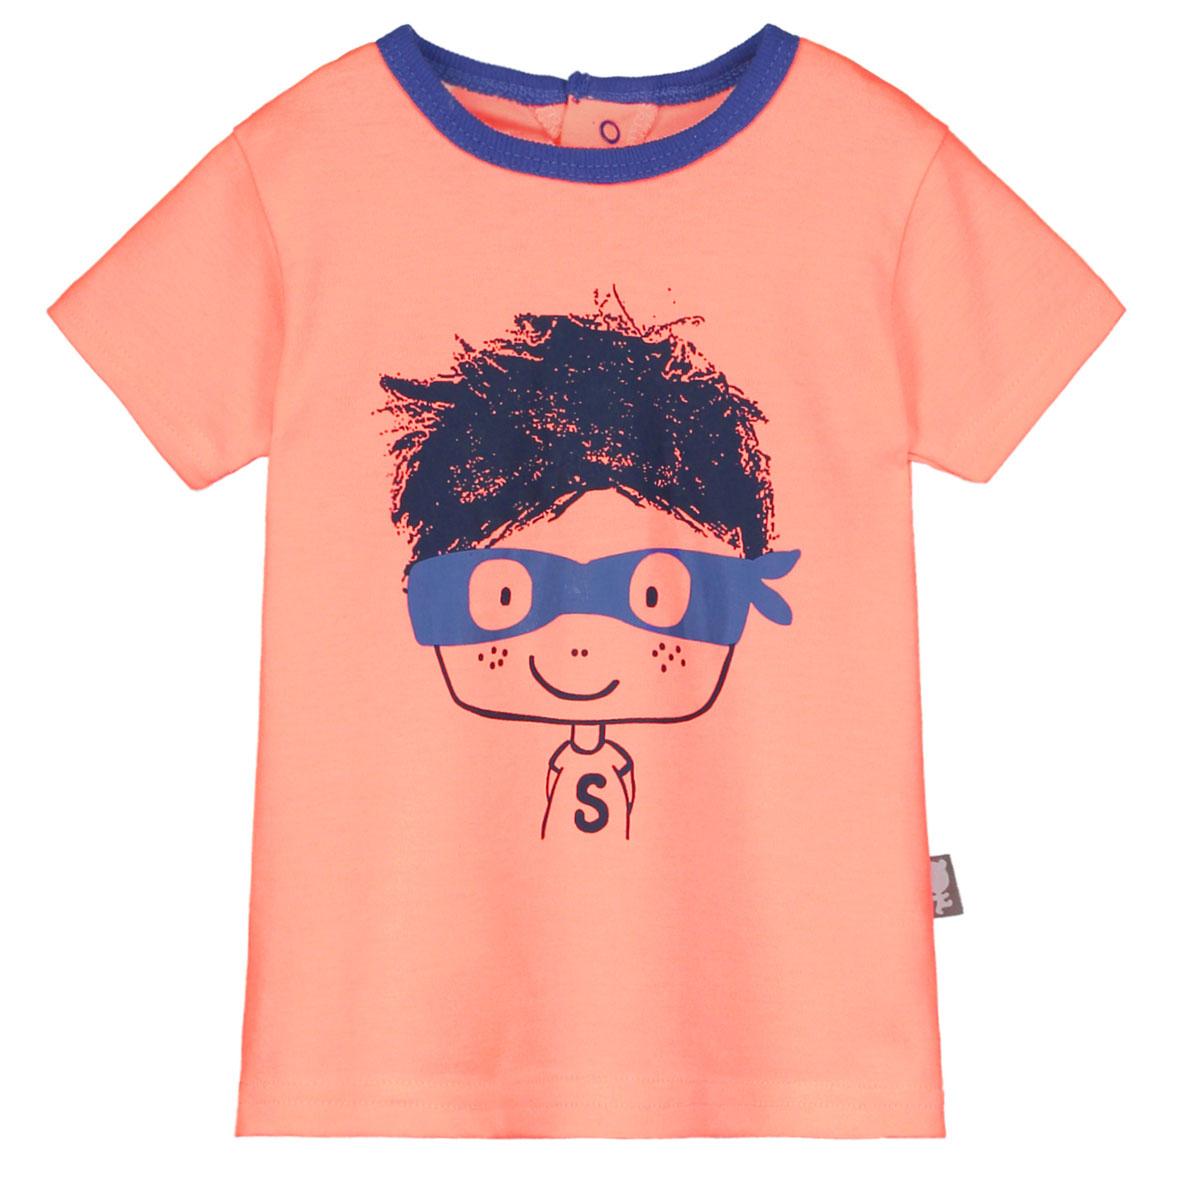 Ensemble t-shirt et pantalon bébé garçon Super Hero